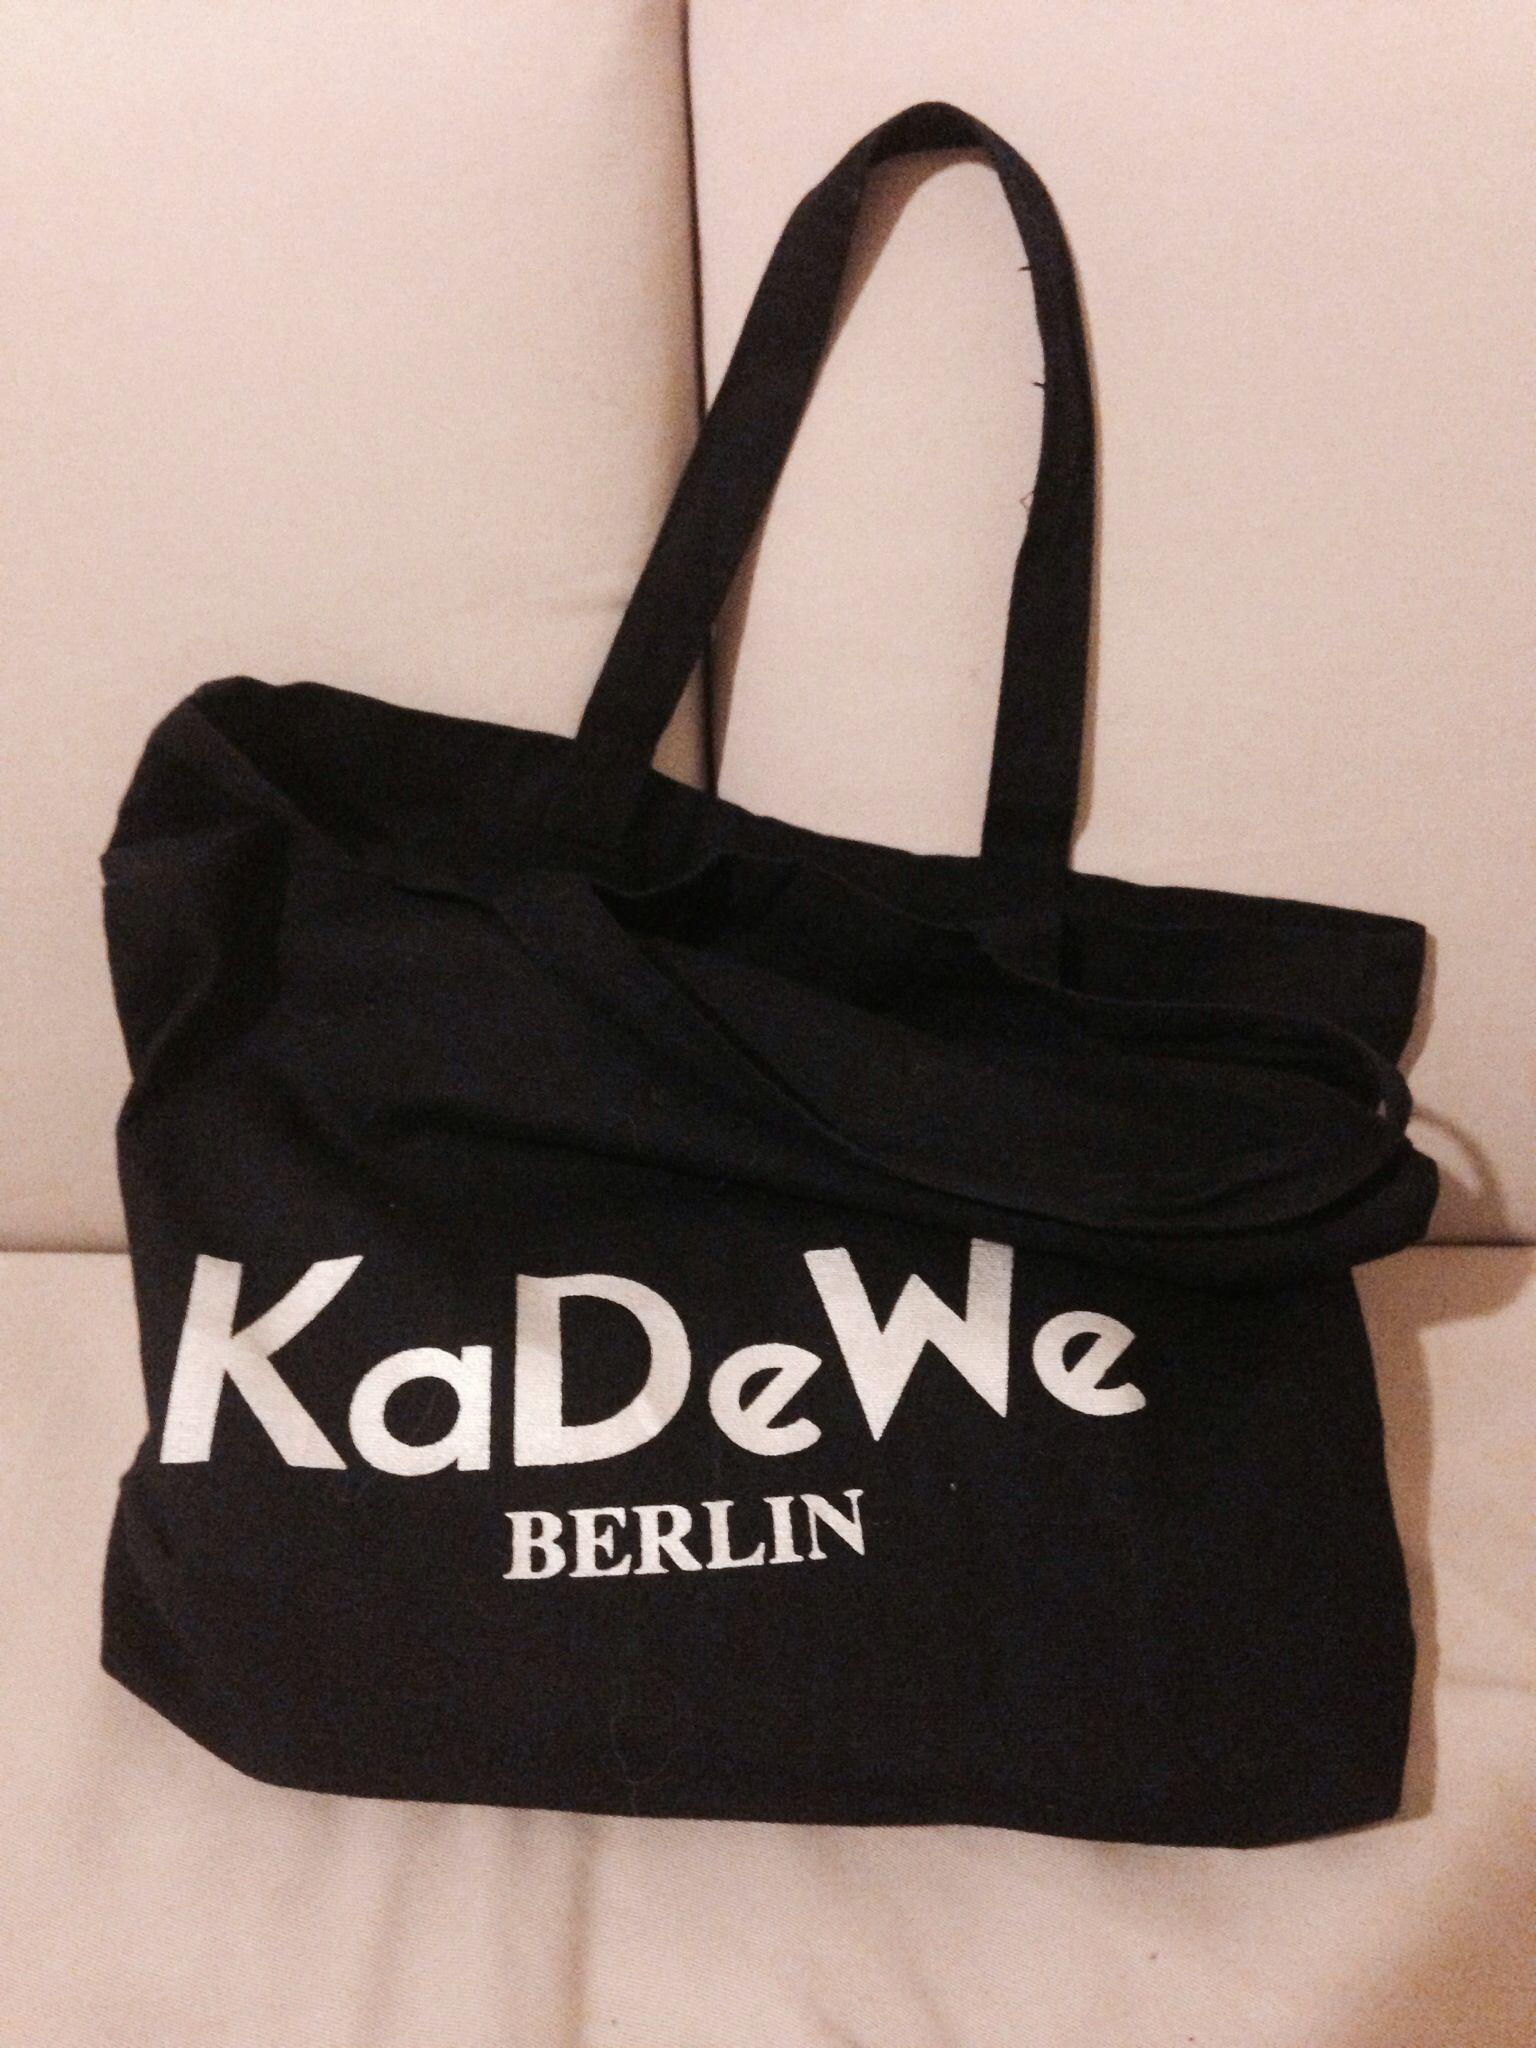 kadewe berlin cotton shopping bag bags pinterest. Black Bedroom Furniture Sets. Home Design Ideas